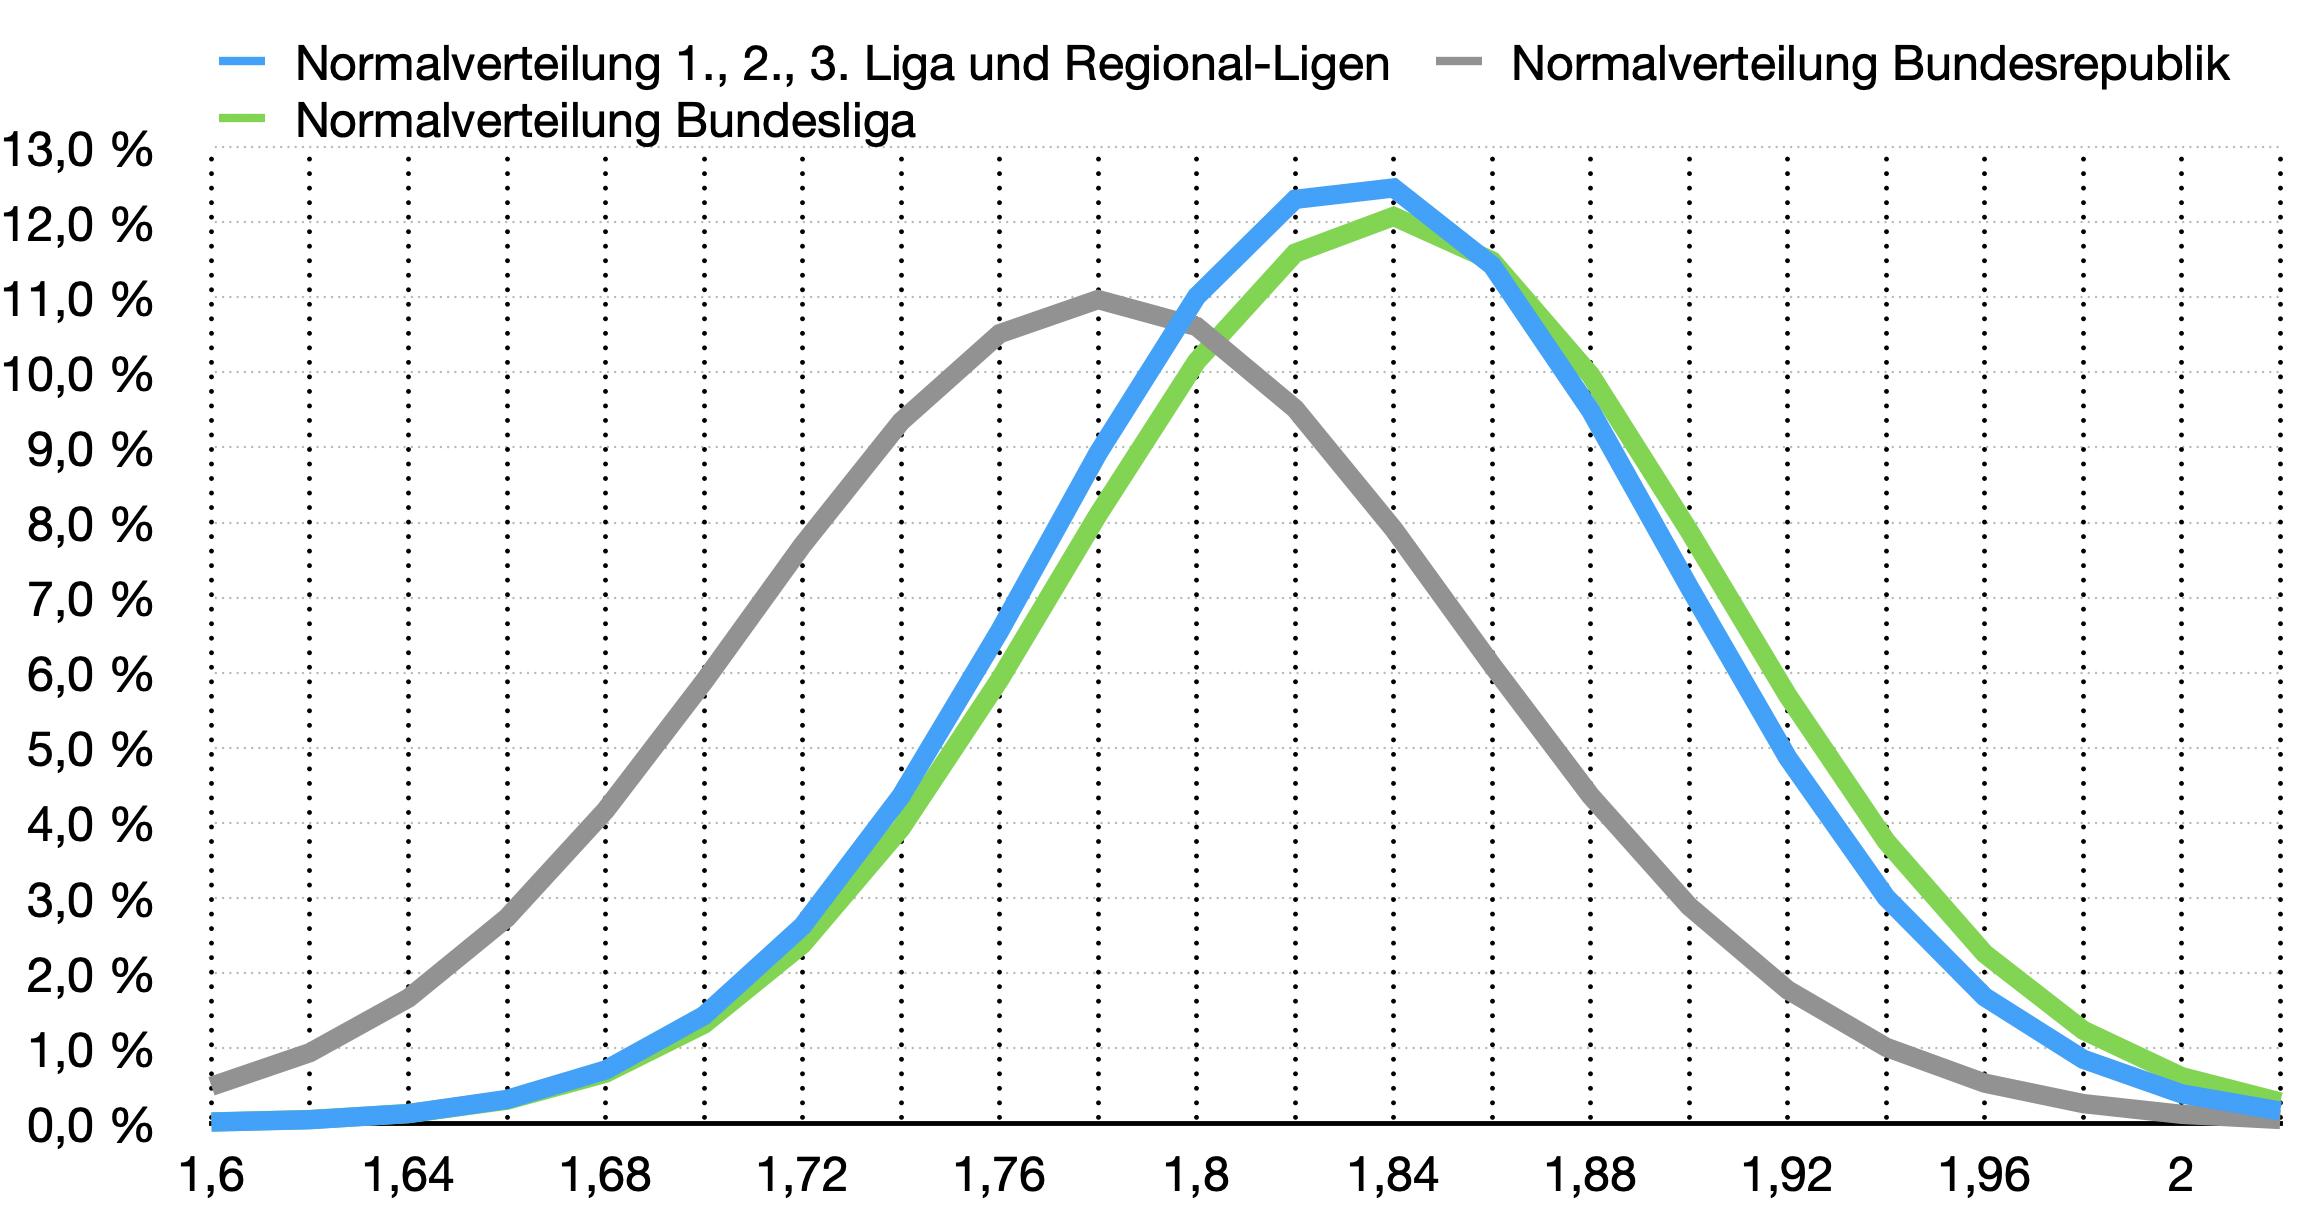 Körpergröße deutschland statistik Die Körpergröße